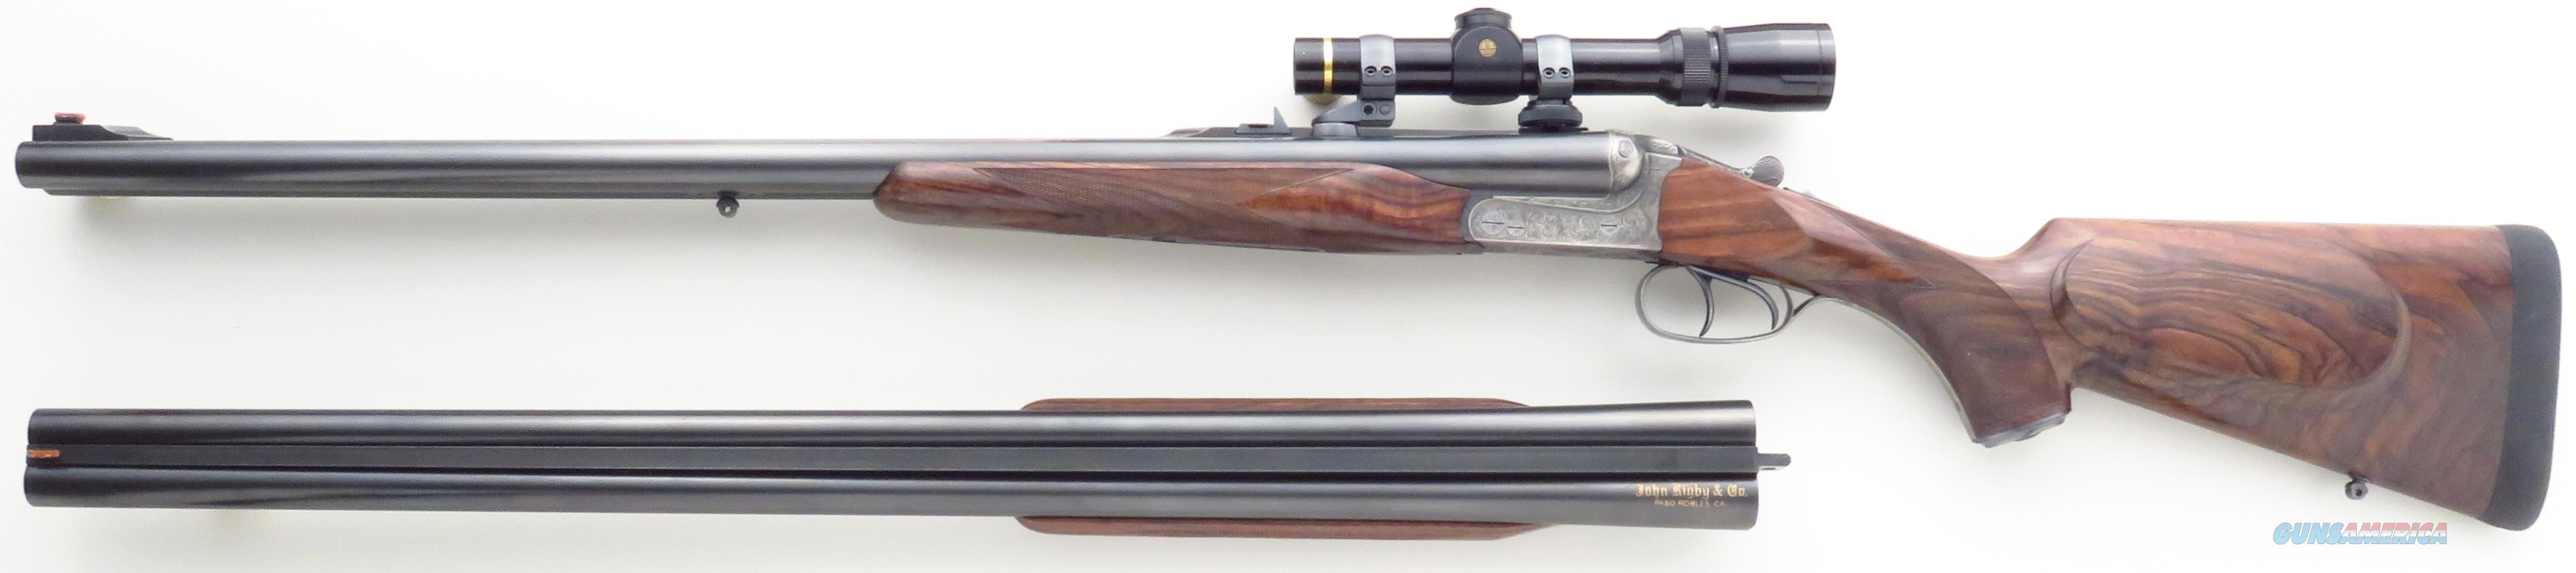 Rigby .470 Nitro Express, extra 12 gauge barrels, case, engraved, EAA quick detach, scope, case, mint condition  Guns > Rifles > Rigby Rifles